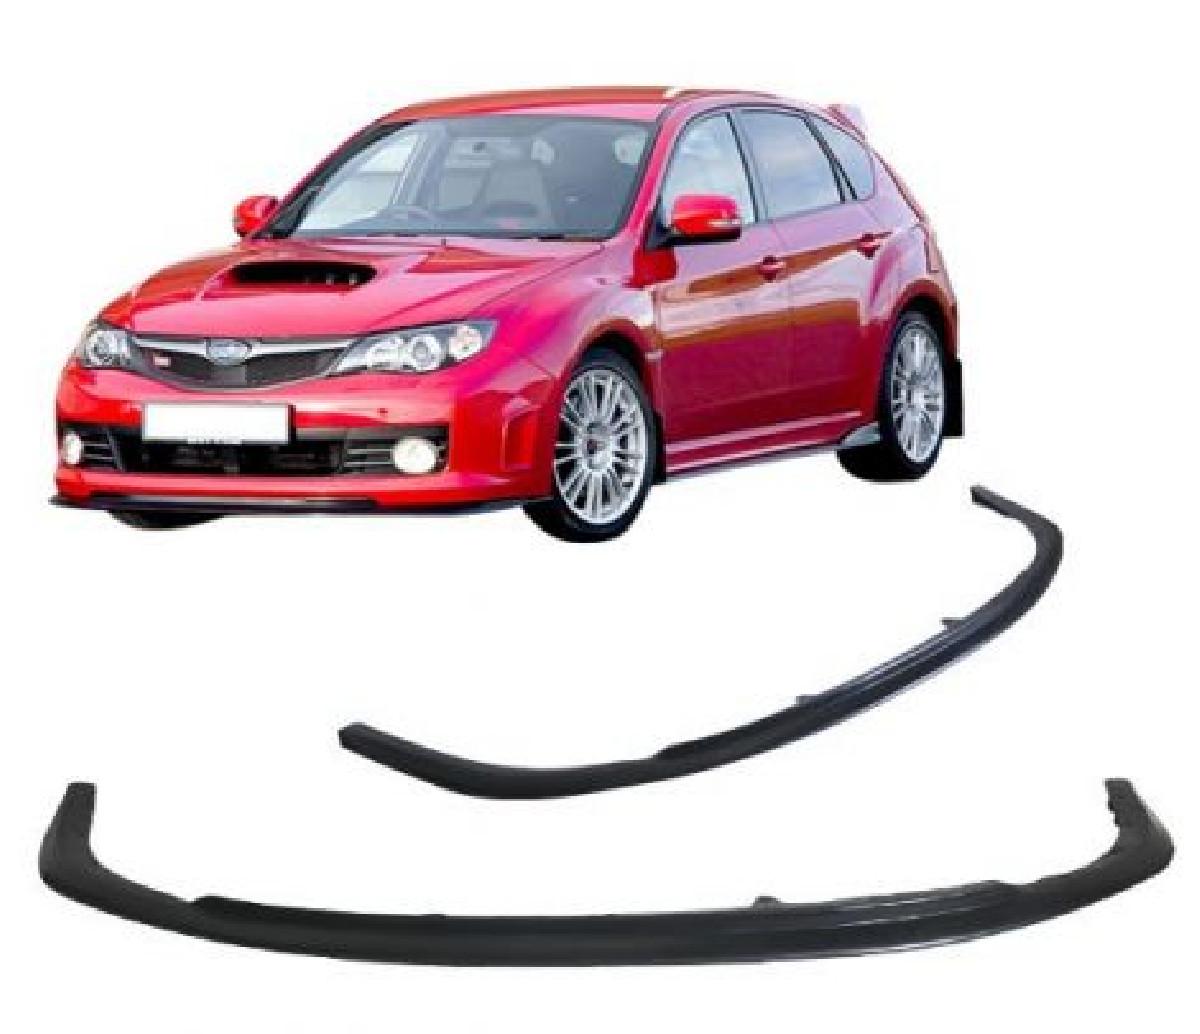 Subaru Impreza 11-14 Chargespeed Style PU Front Bumperlip